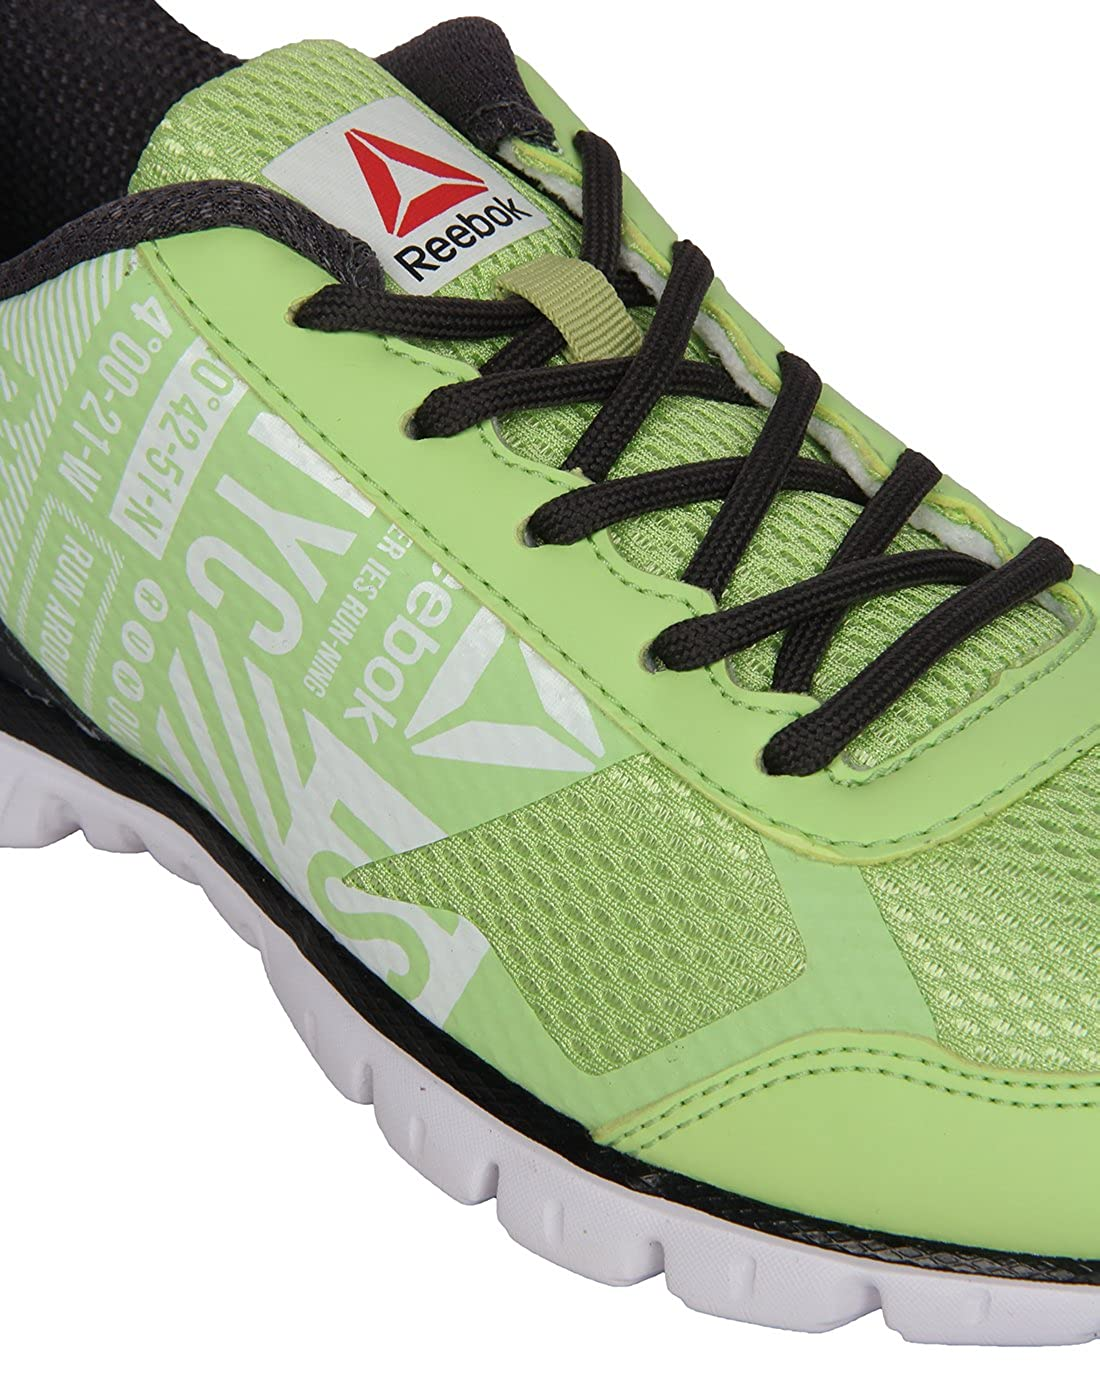 Reebok Men's LimeGravel Running Shoes 6 UKIndia (39 EU)(8.5 US)